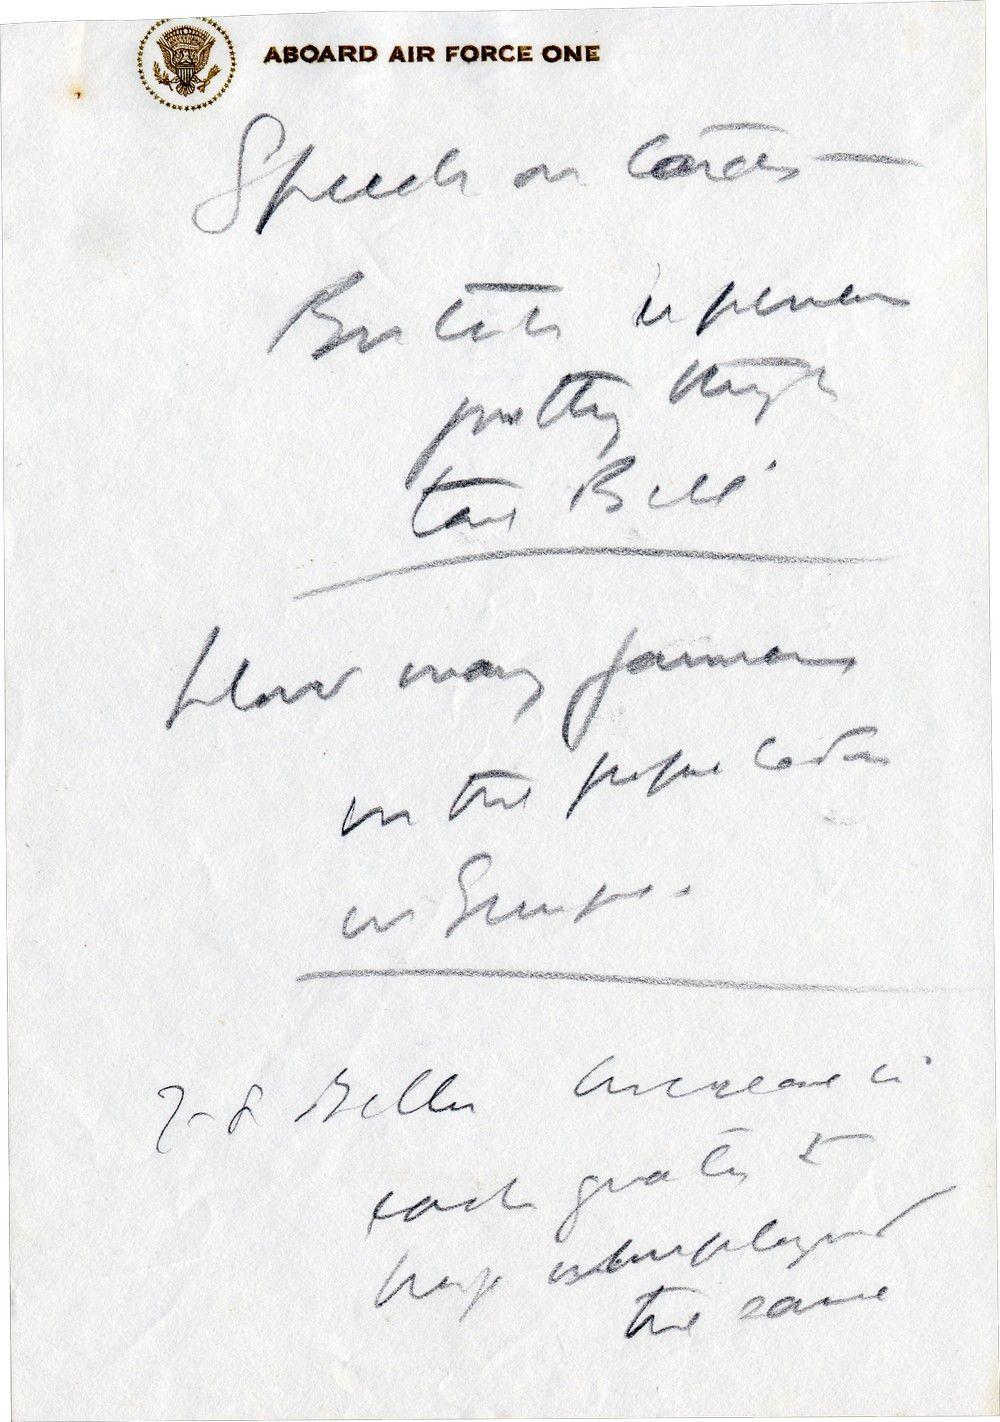 Page 3 transcript